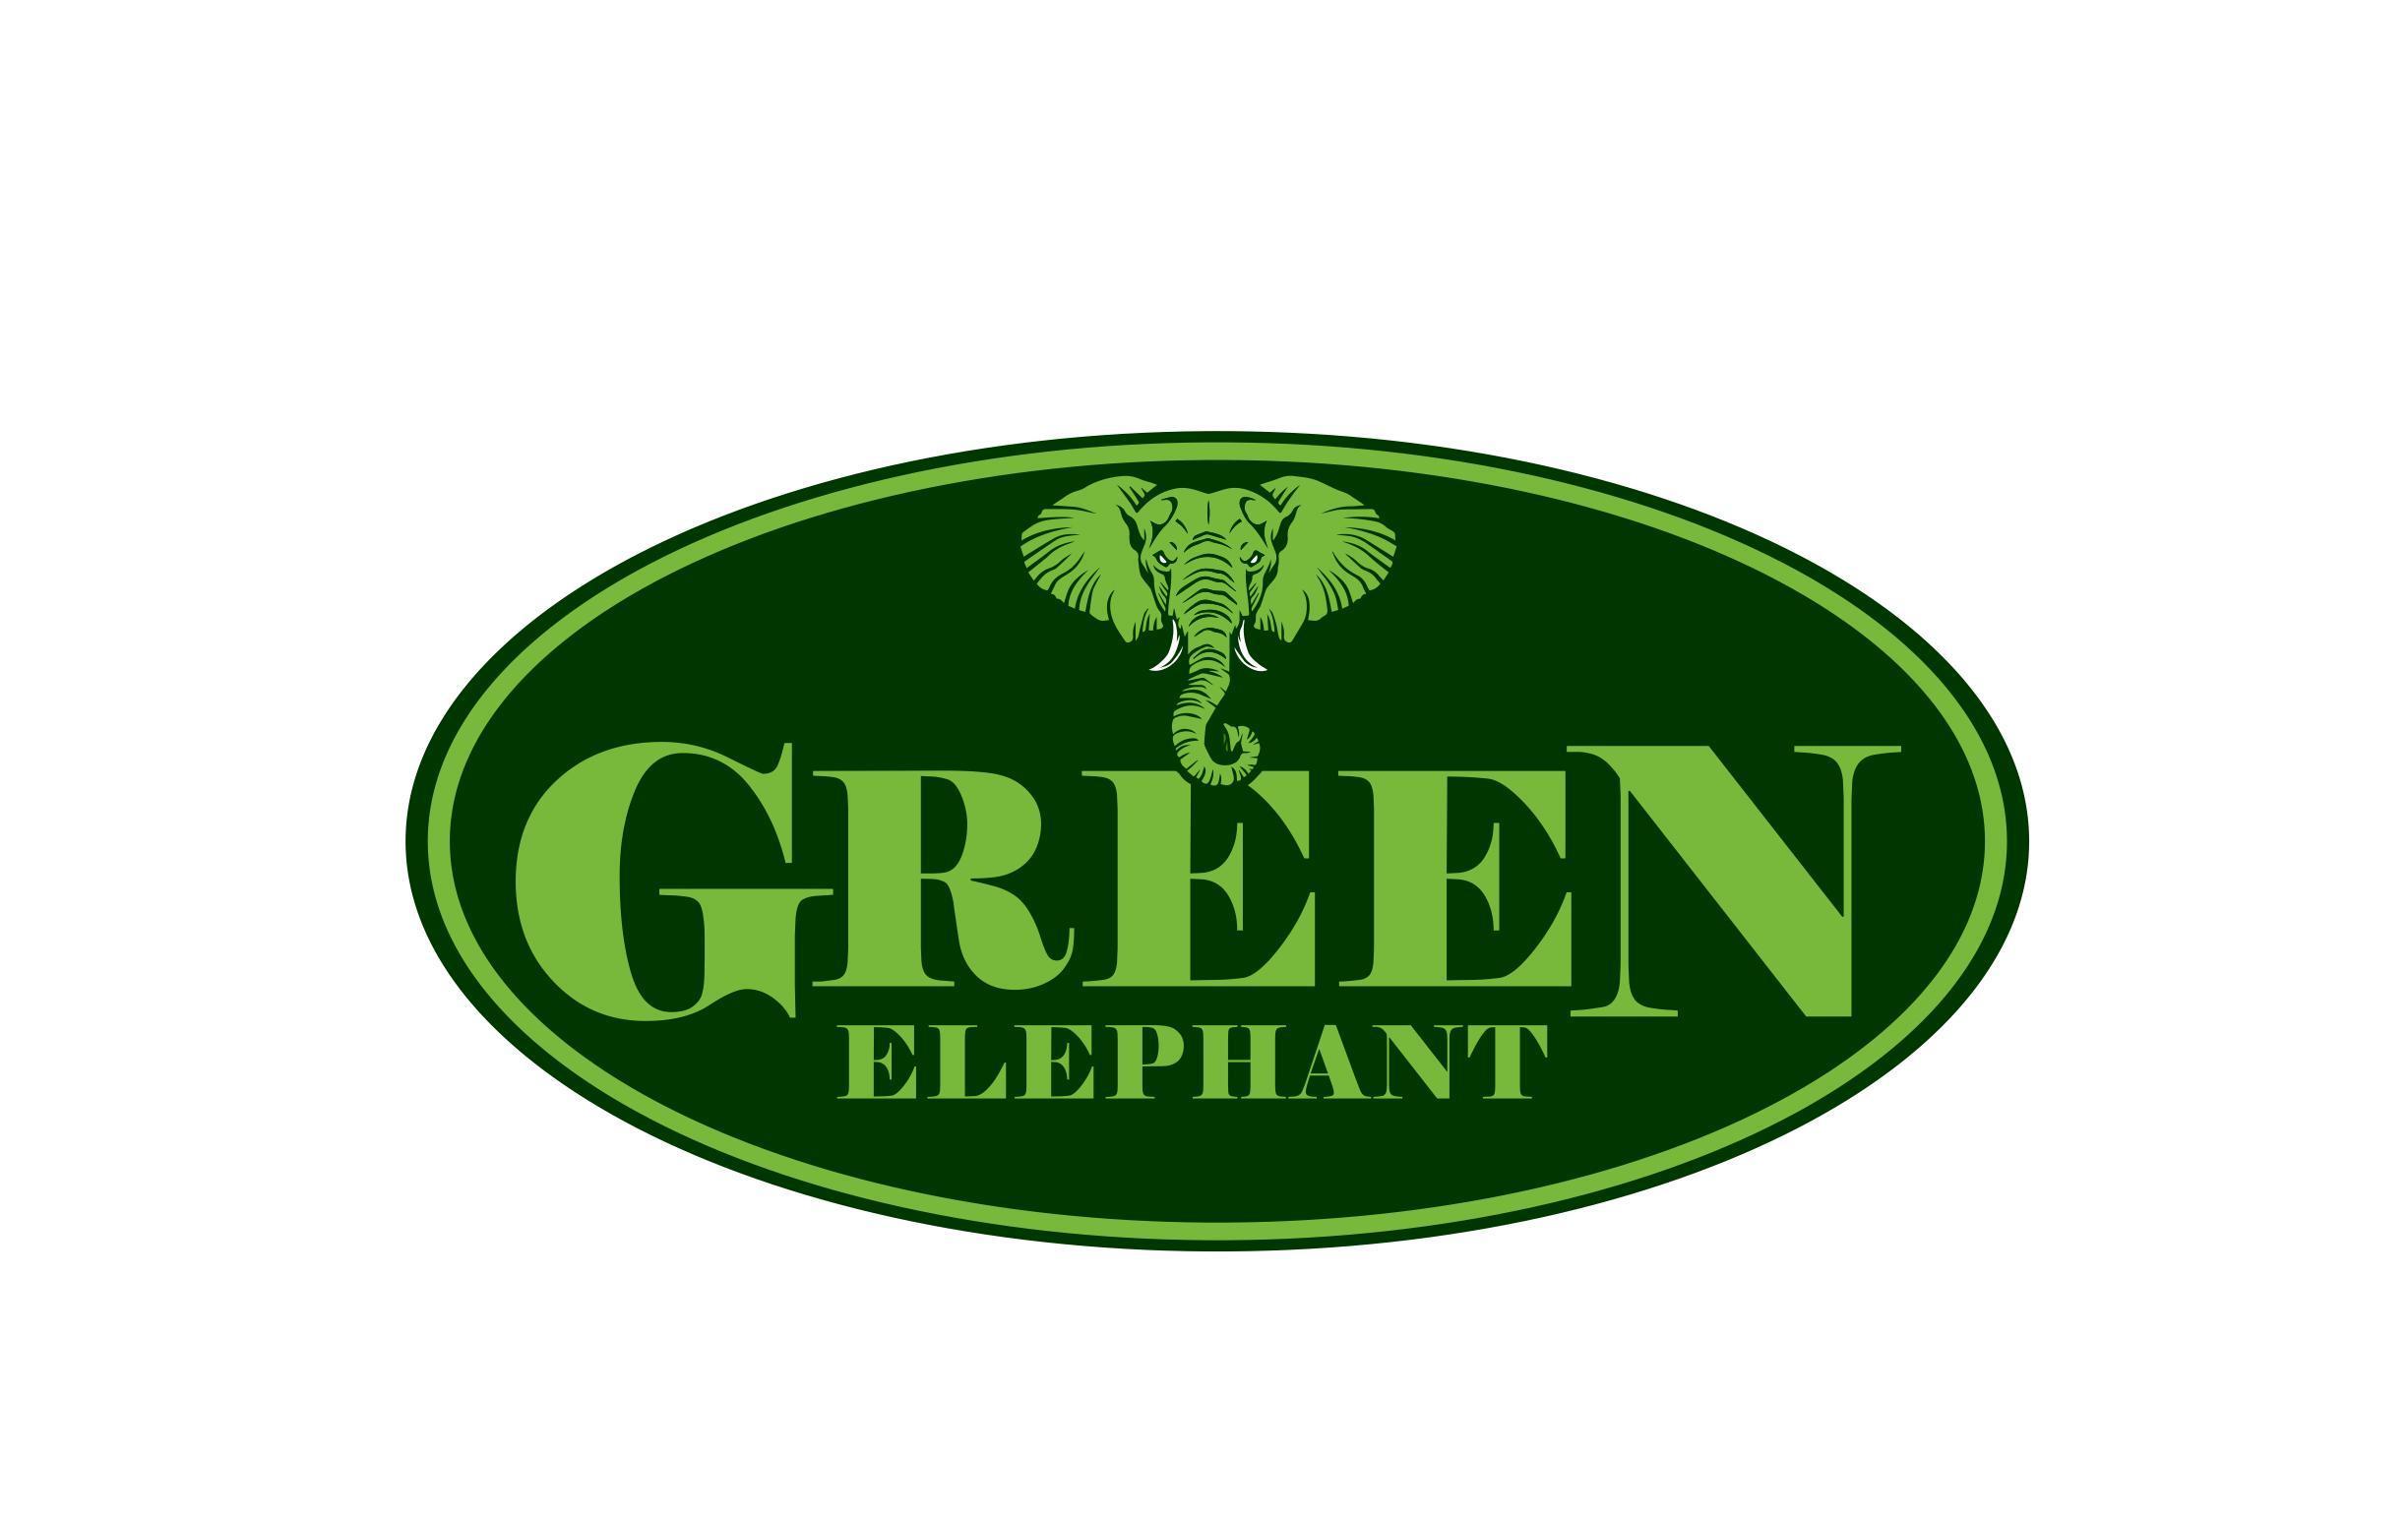 Green Elephant logo